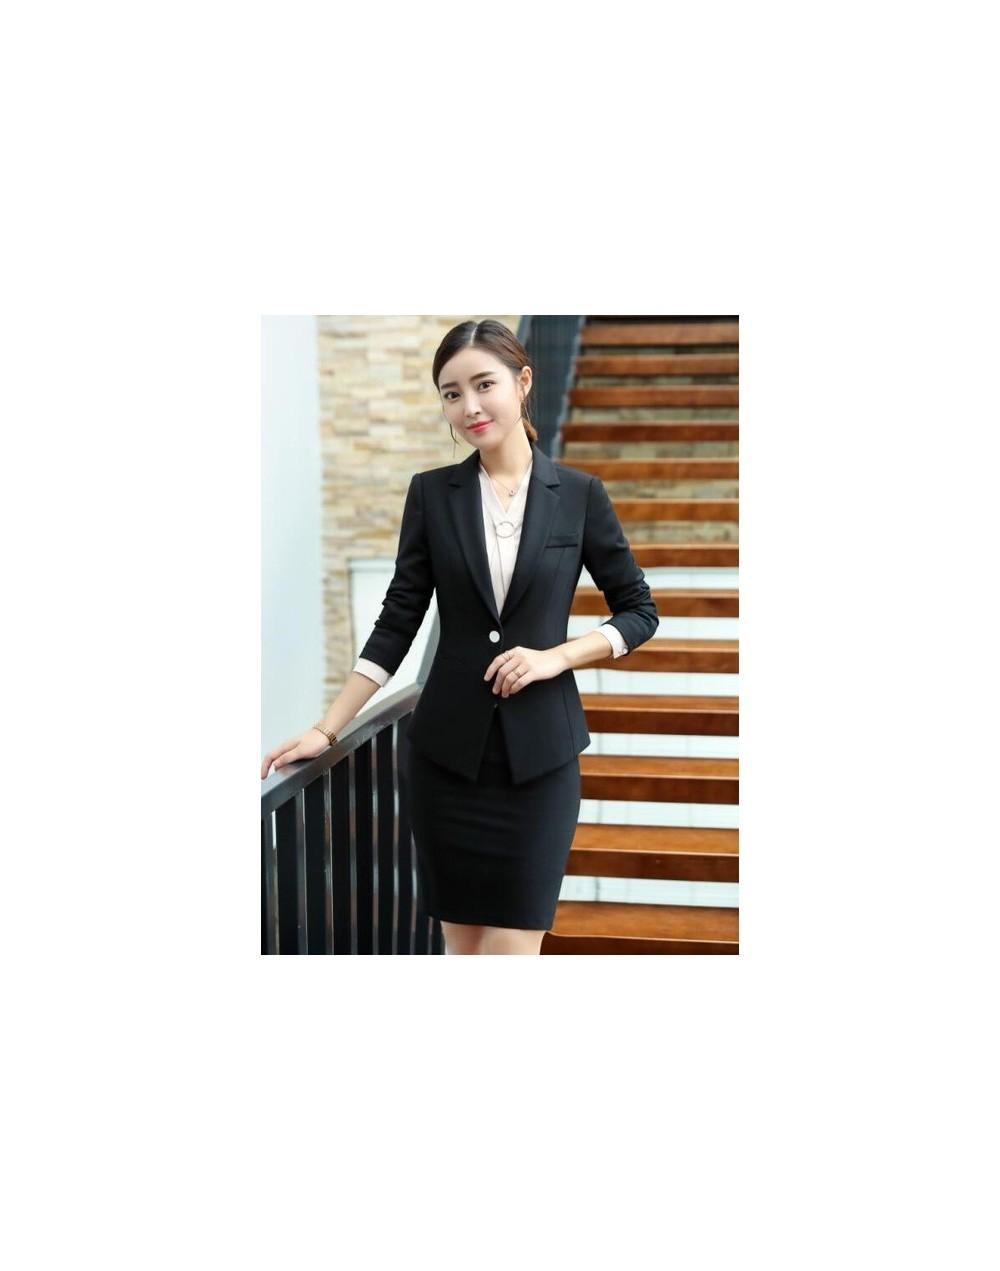 Business Skirt suit women Autumn Winter fashion ladies clothes interview formal blazer and skirt office plus size work unifo...